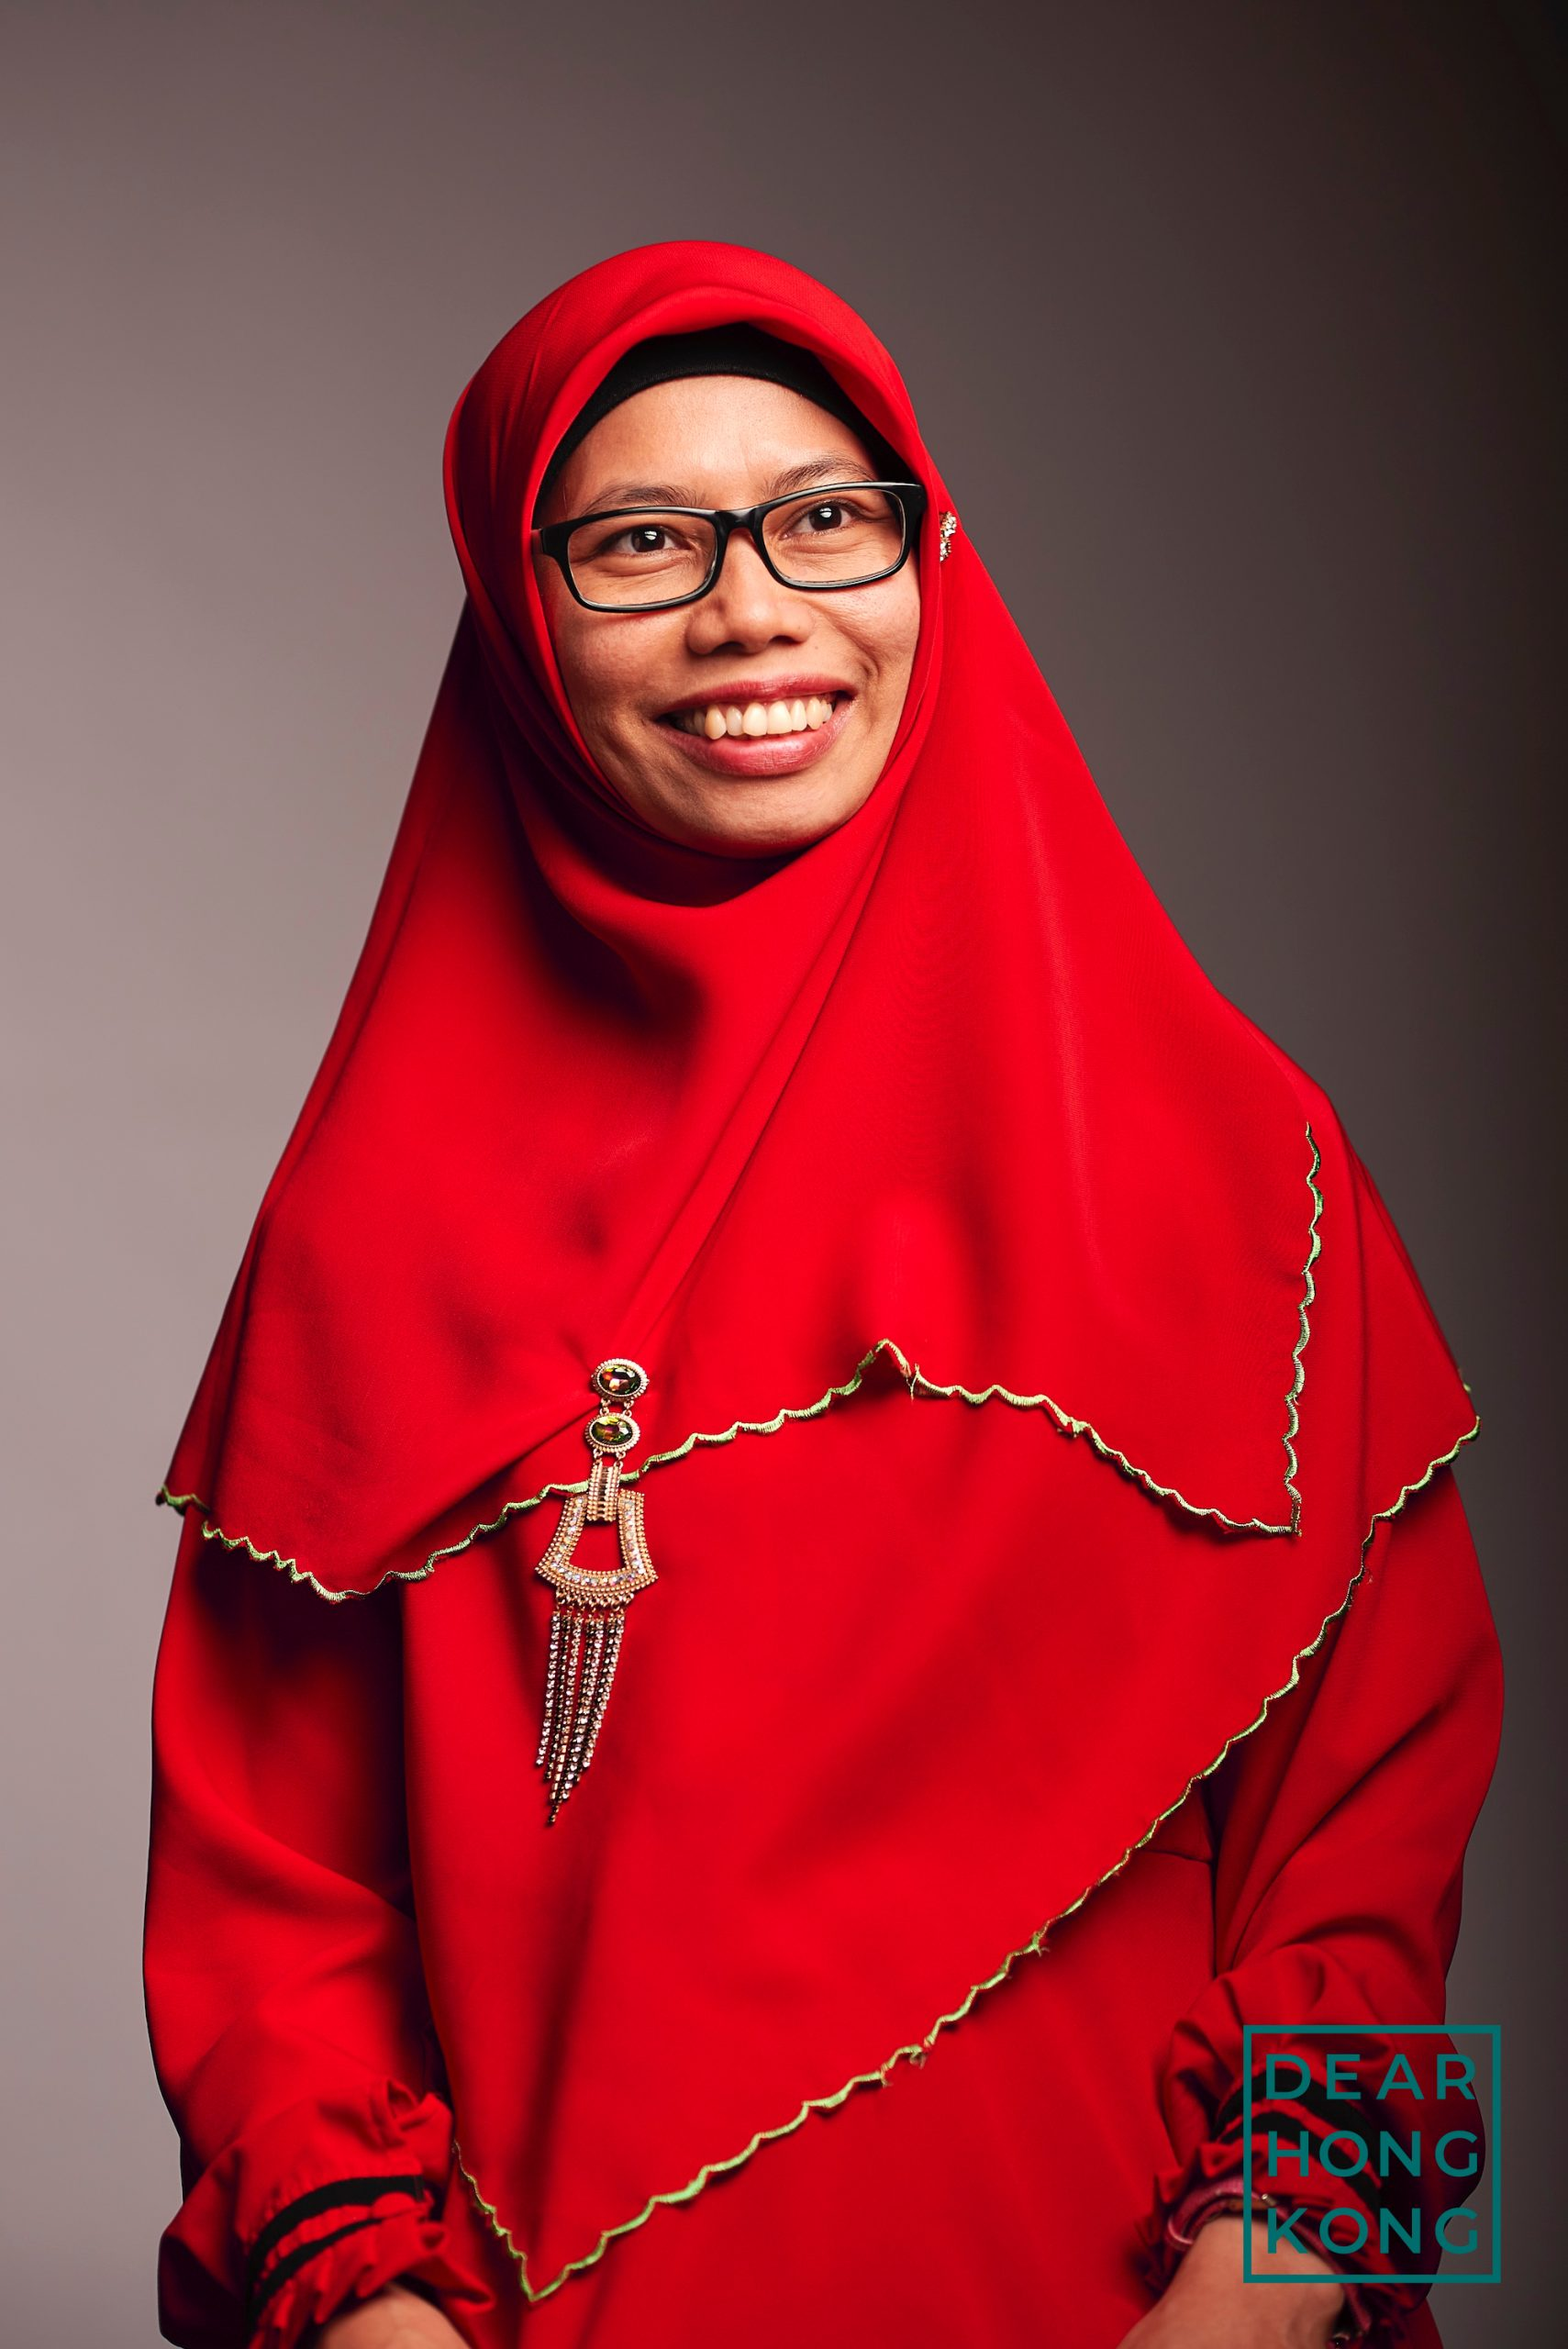 Indonesia - Romlah Rosidah by Bradley Aaron @bradley_aaron_portraits